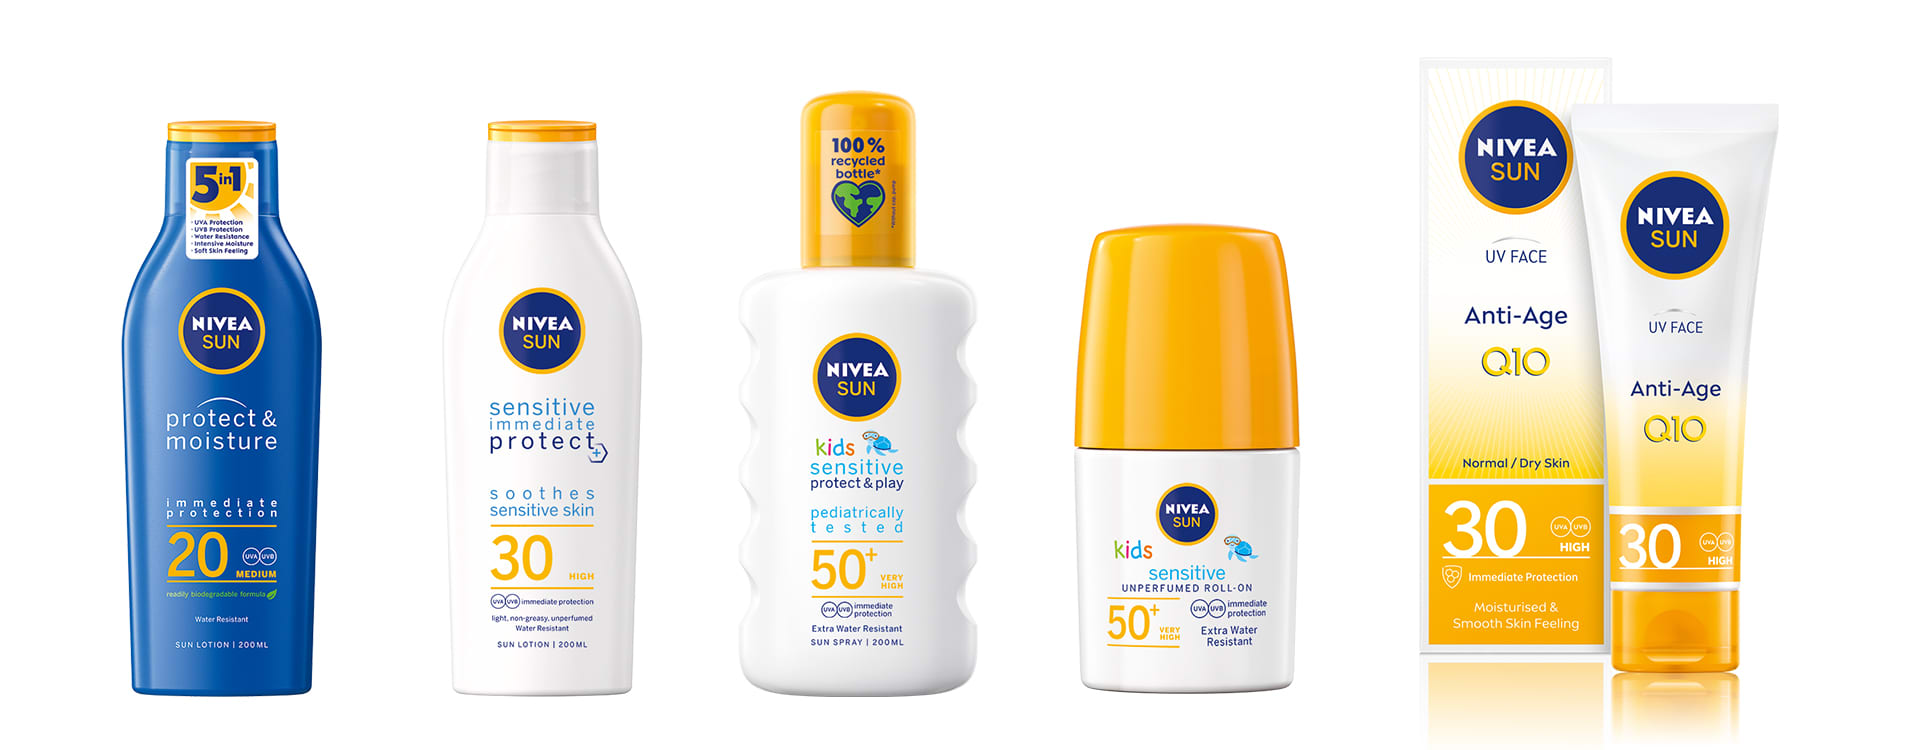 NIVEA Sun Protect, Sensitive-serien, som er tilpasset sensitiv hud og barn og NIVEAs UV Face SPF 30.